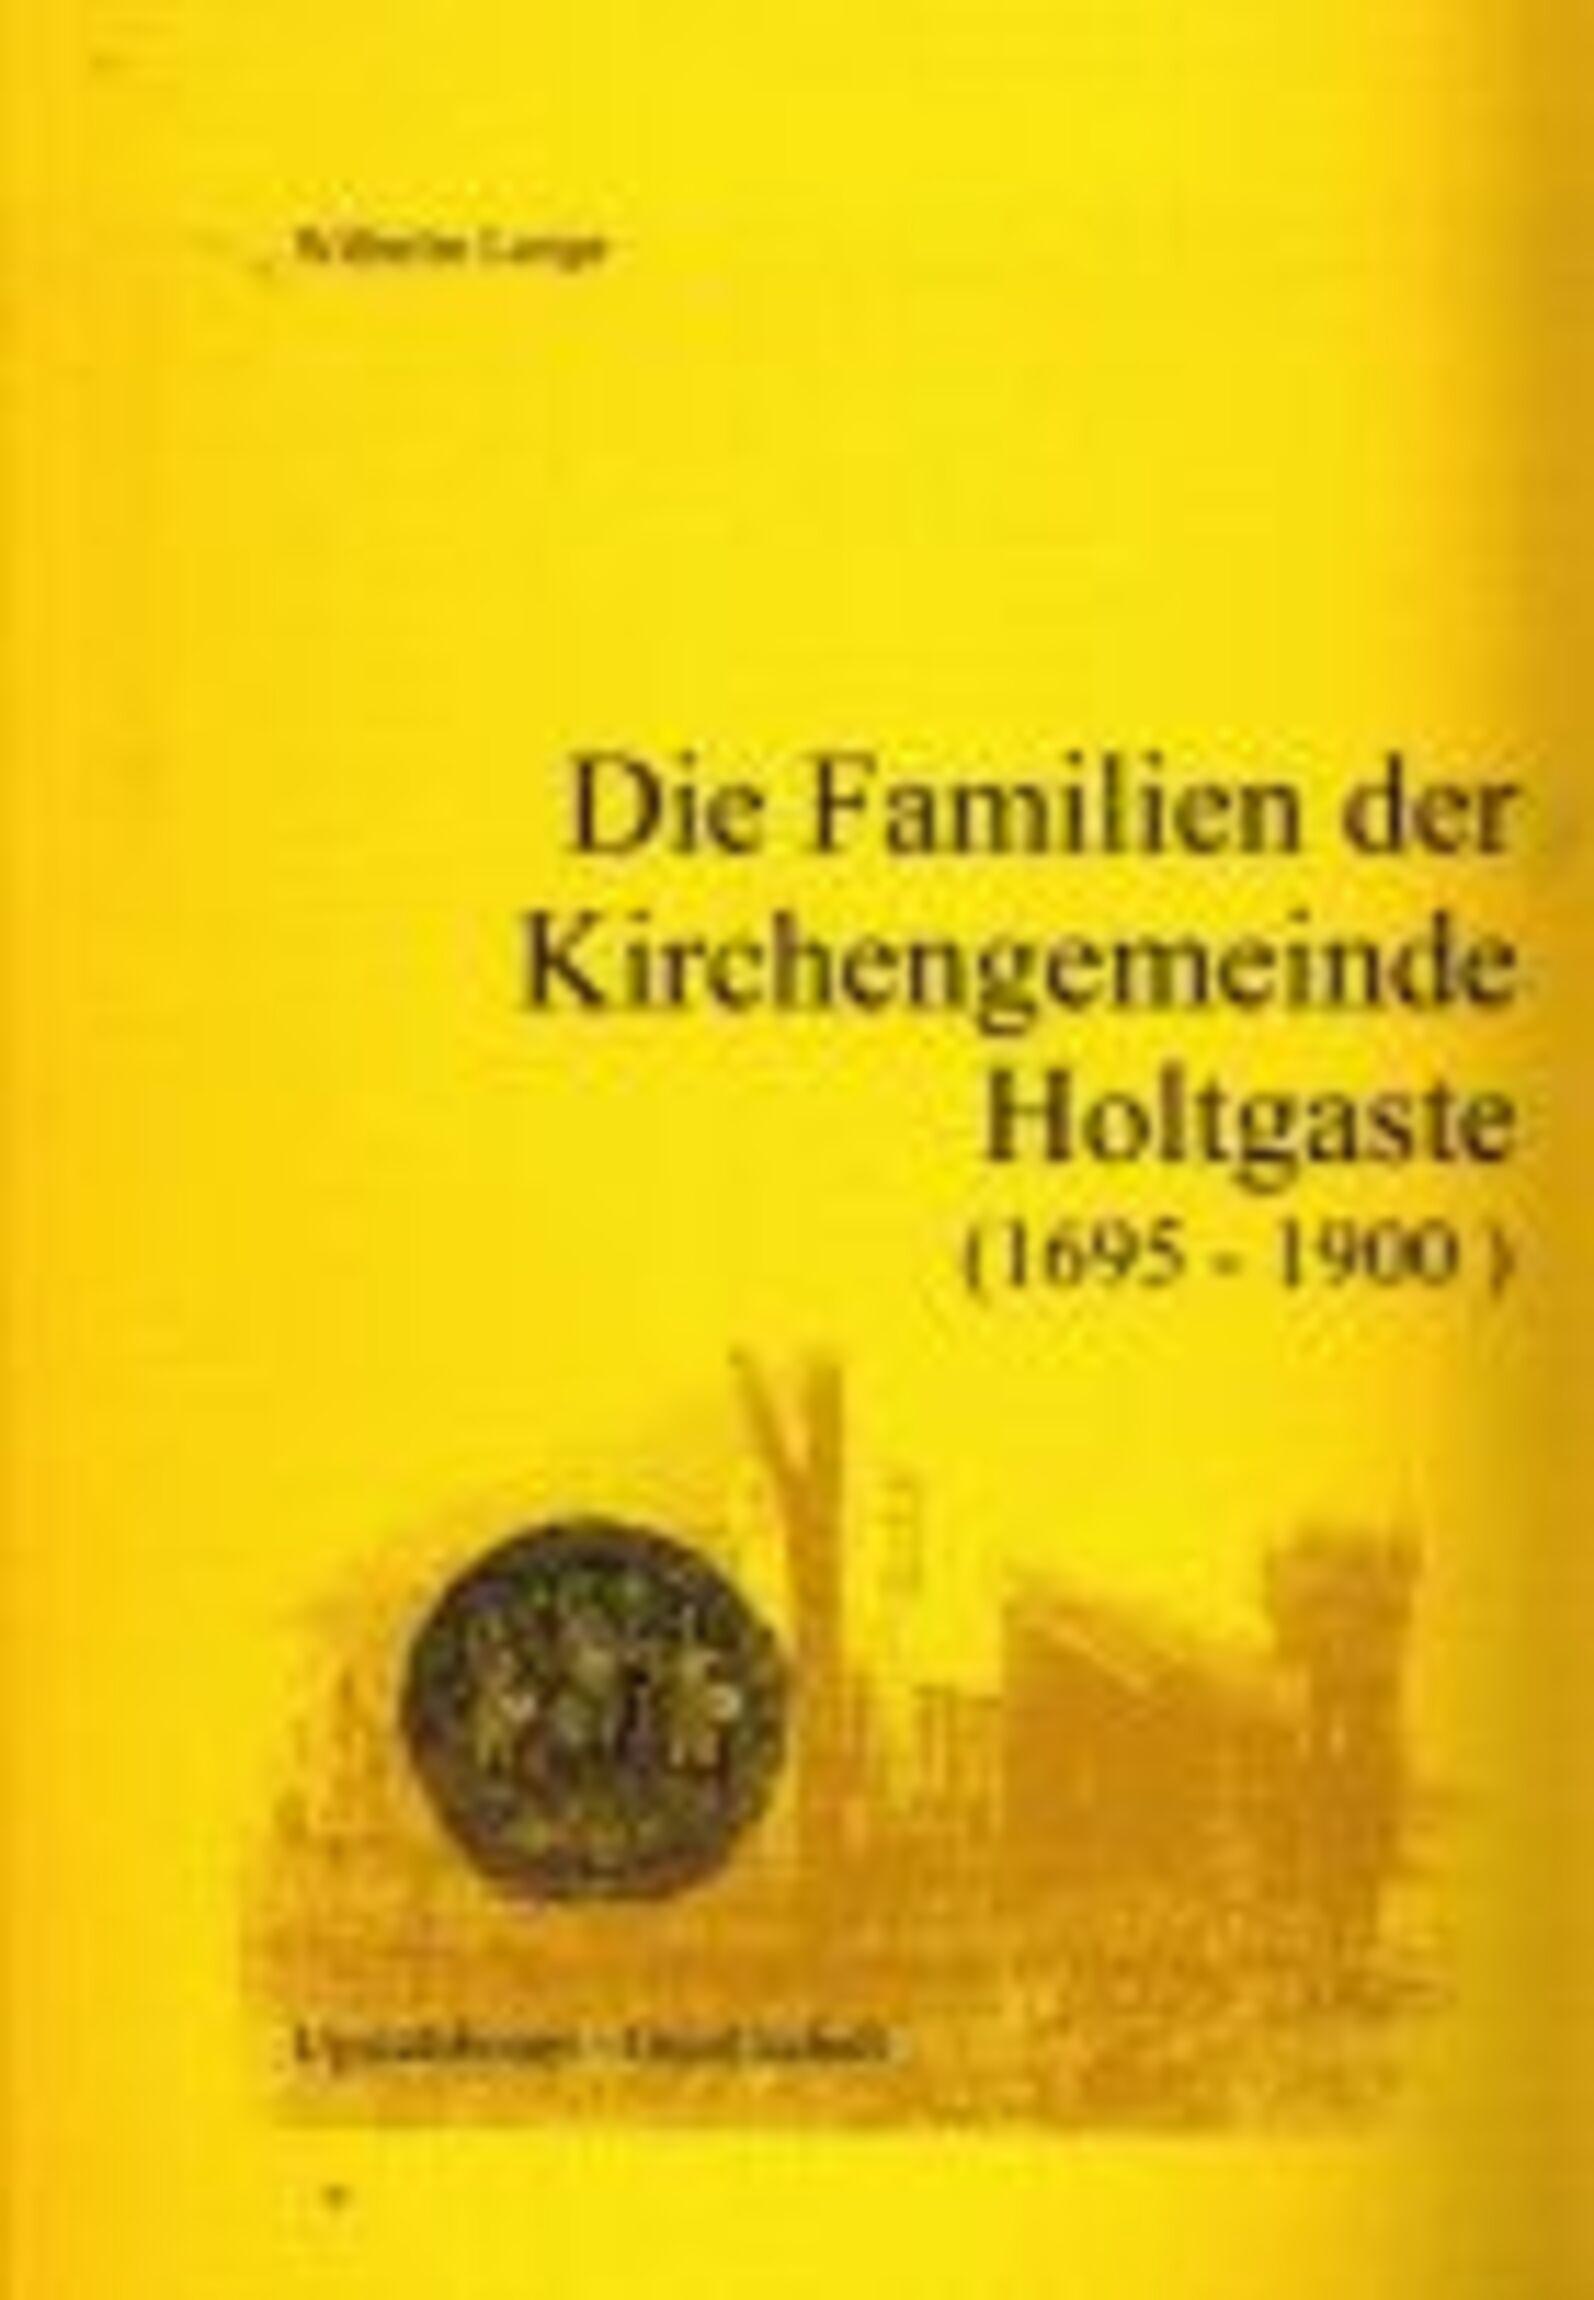 Ortssippenbuch Holtgaste